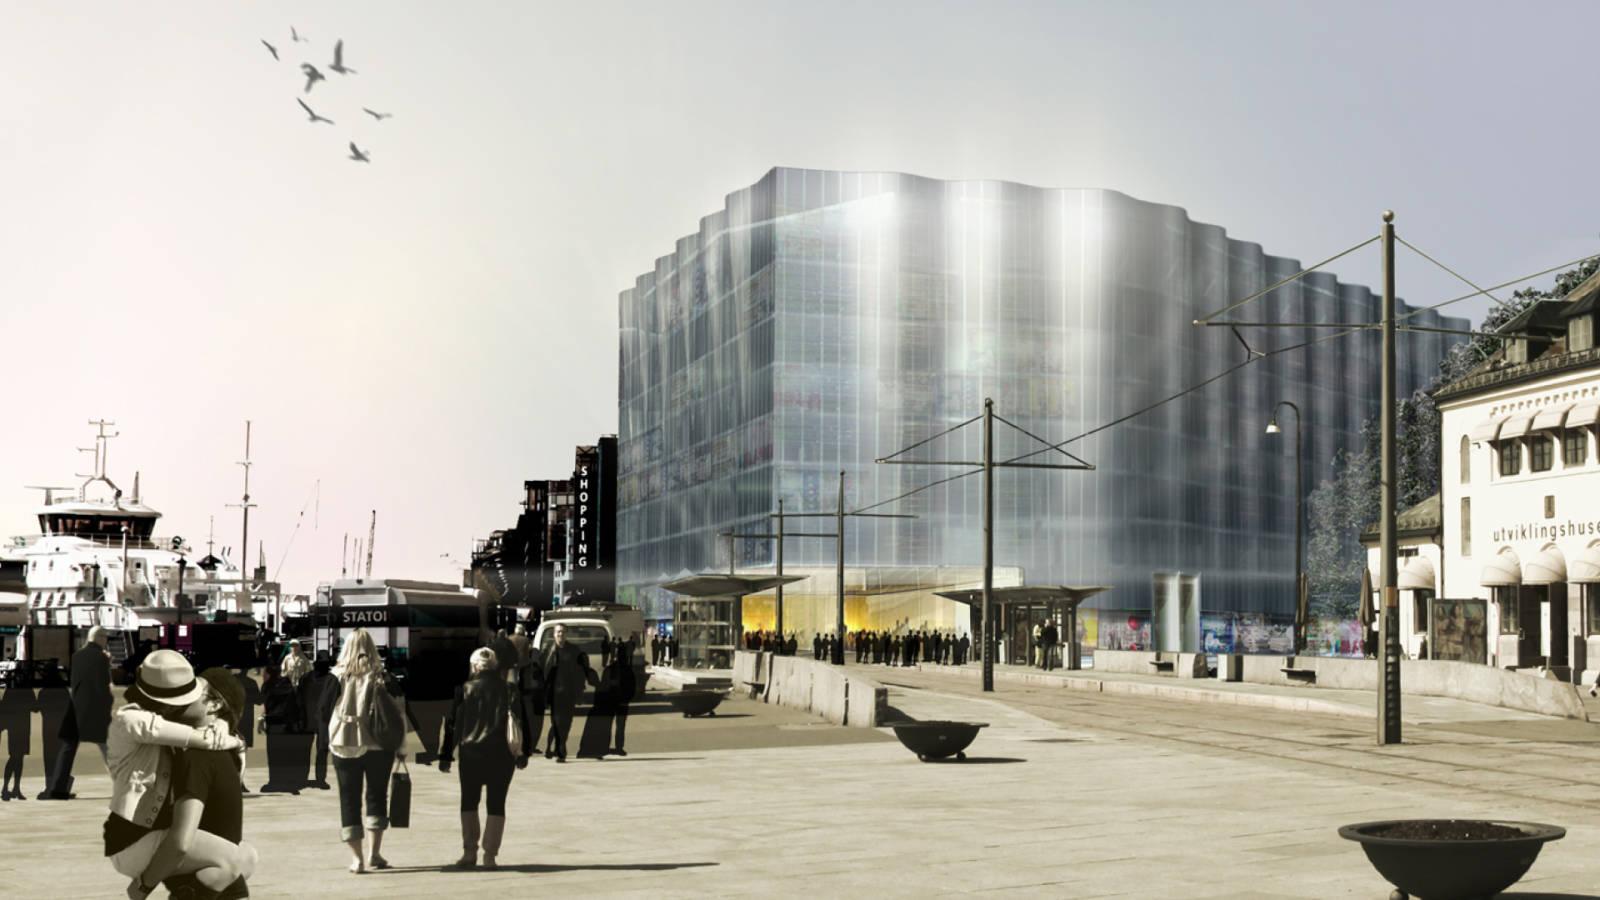 CLEAN CUT ENTRANCE - Aker Brygge Masterplan - SPOL Architects